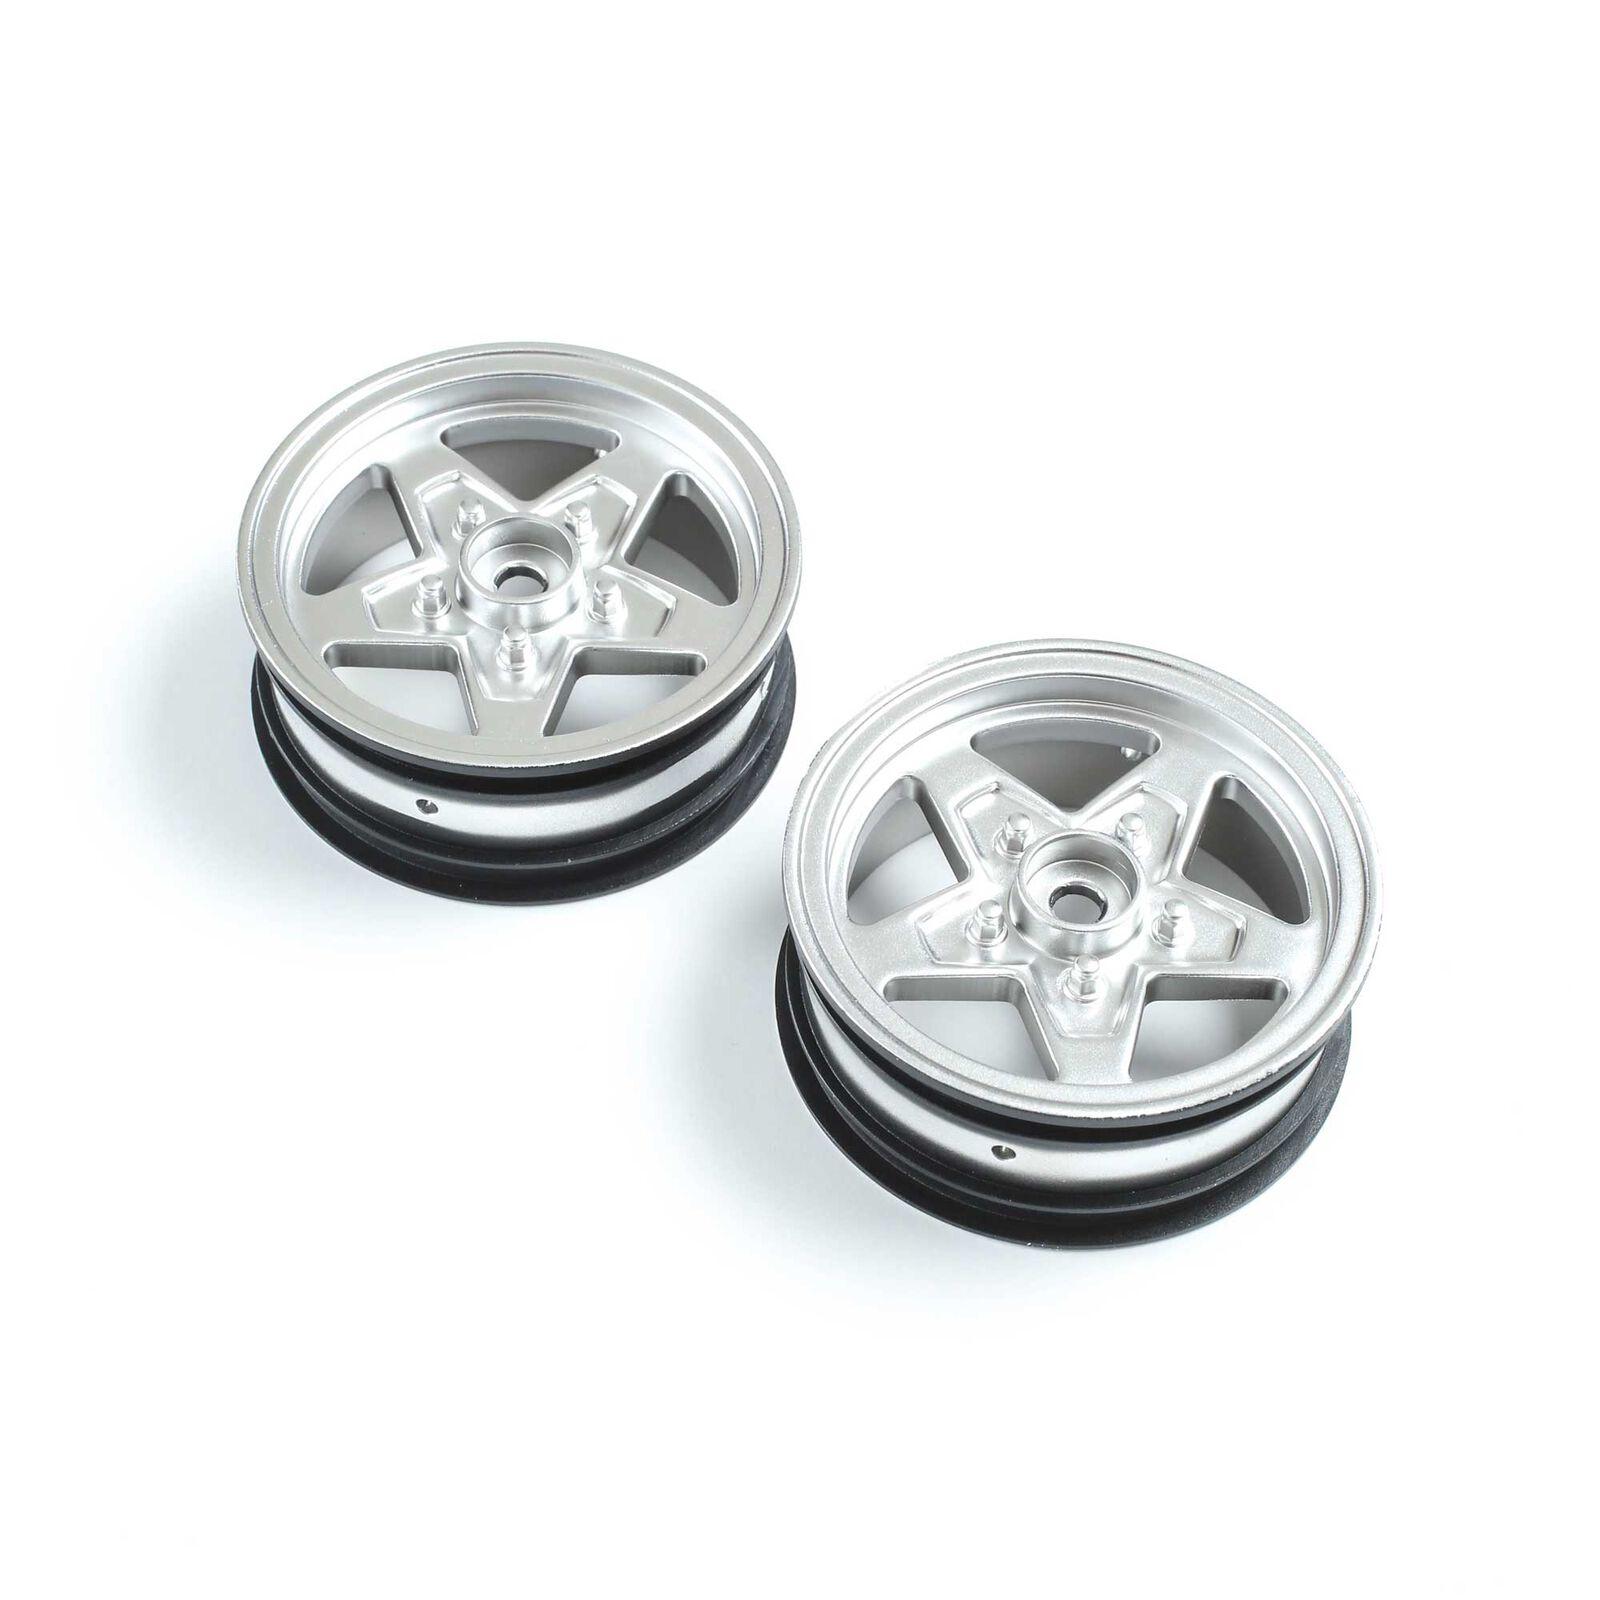 Front Wheel, Satin Chrome (2): 22S Drag